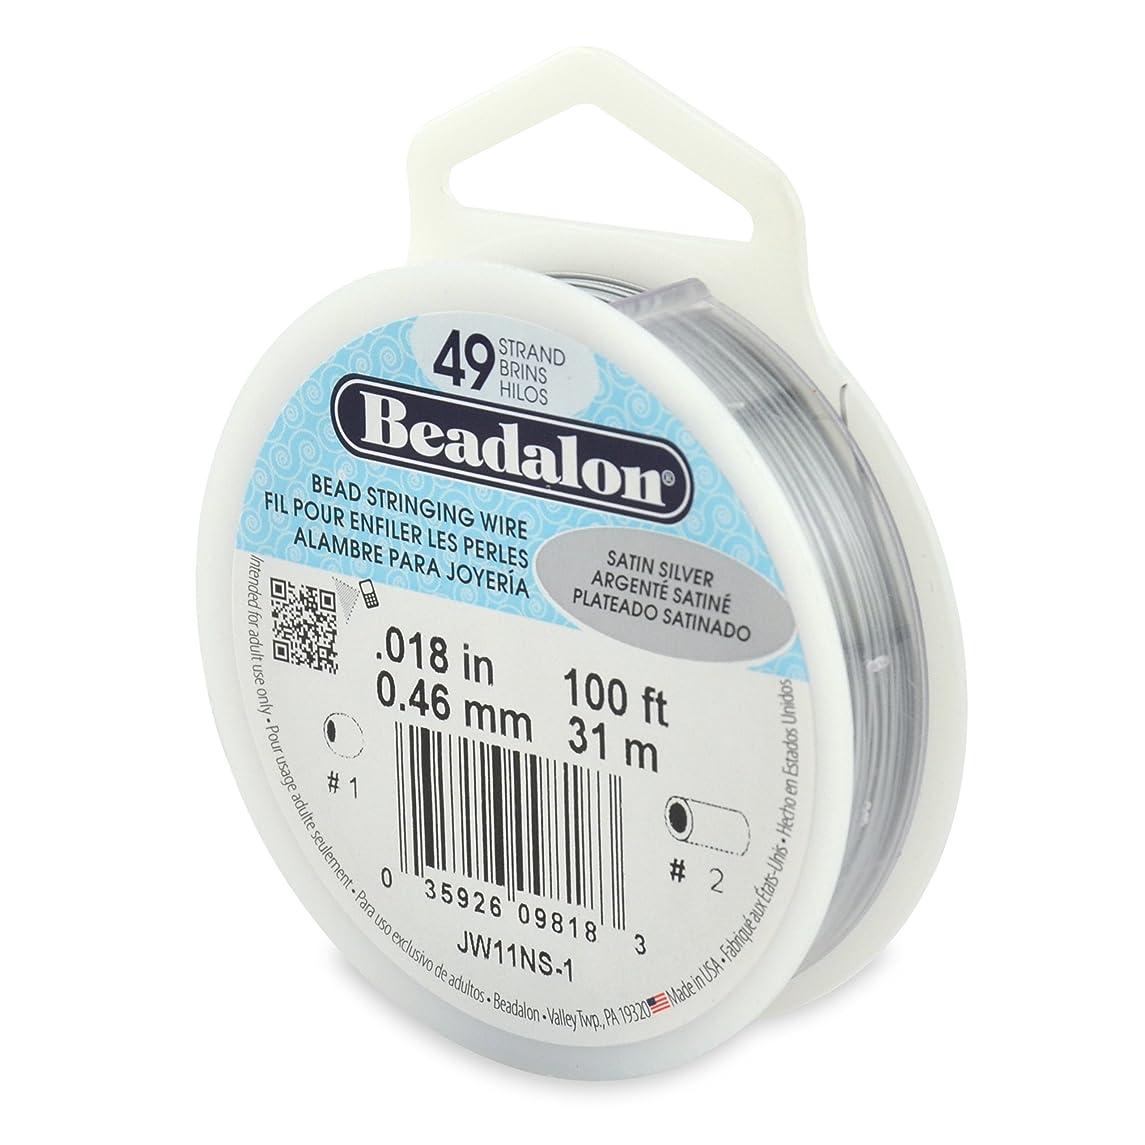 Beadalon 49-Strand Bead Stringing Wire, 0.018-Inch, Satin Silver, 100-Feet